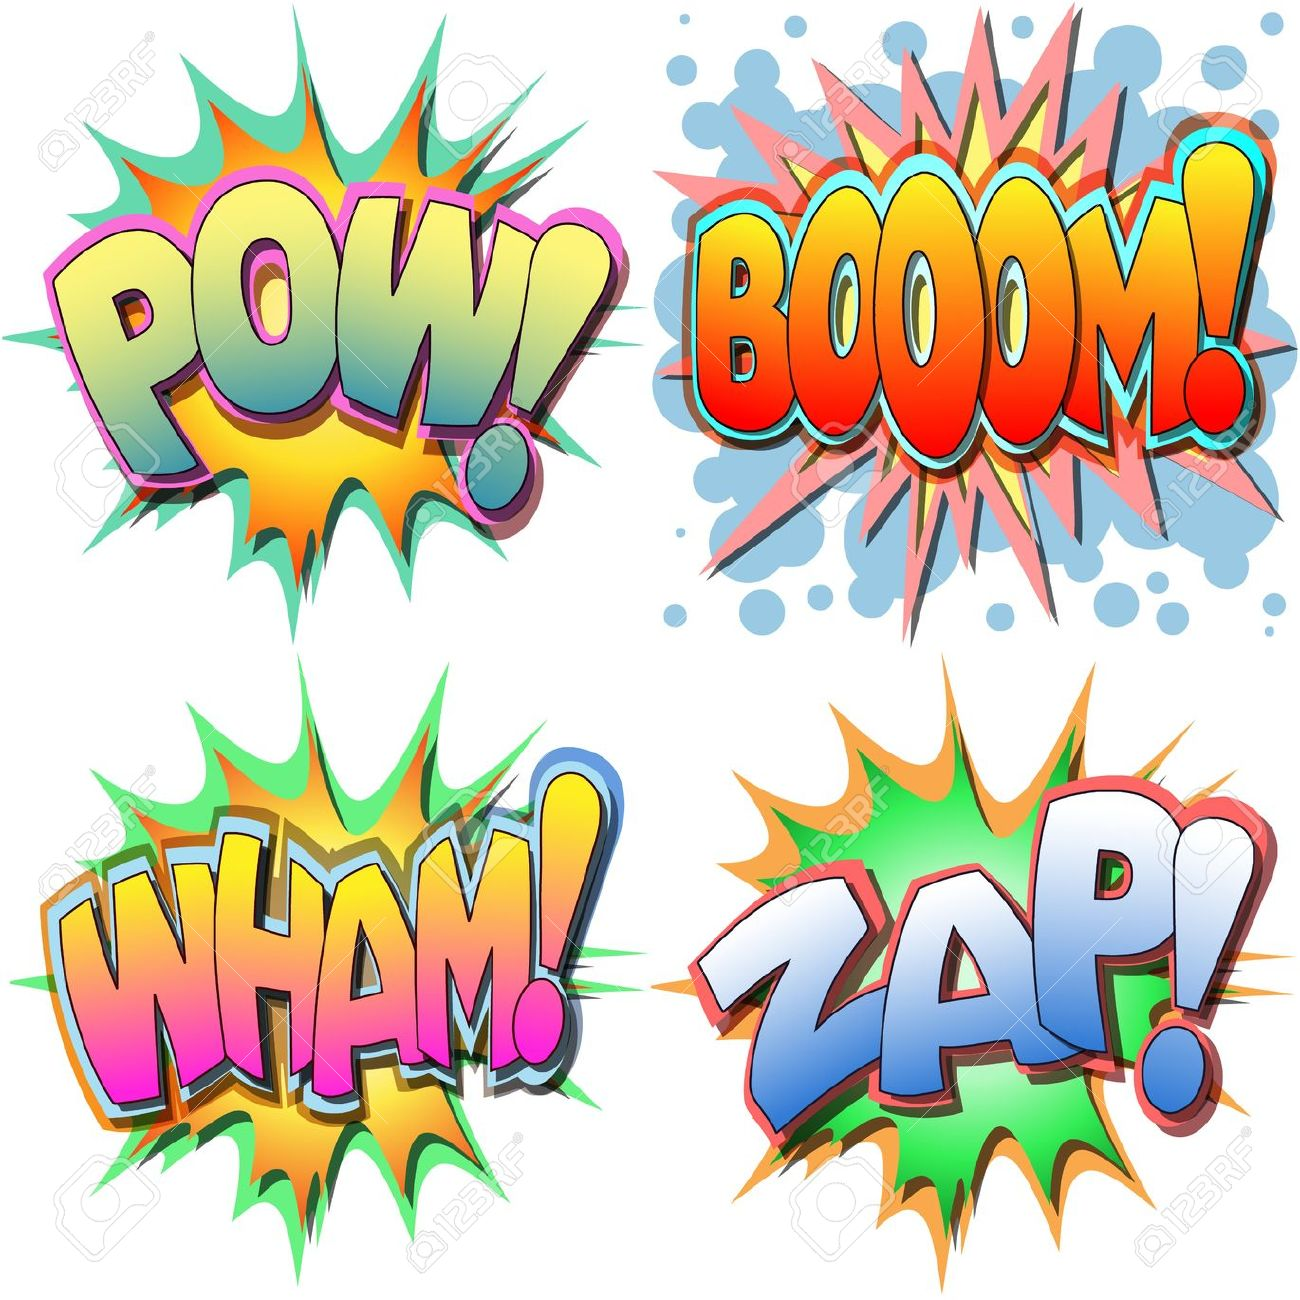 Superhero Signs • Boom, Pow, Zap, Bam, Pop • 8.5 x 11 • PRINTED.